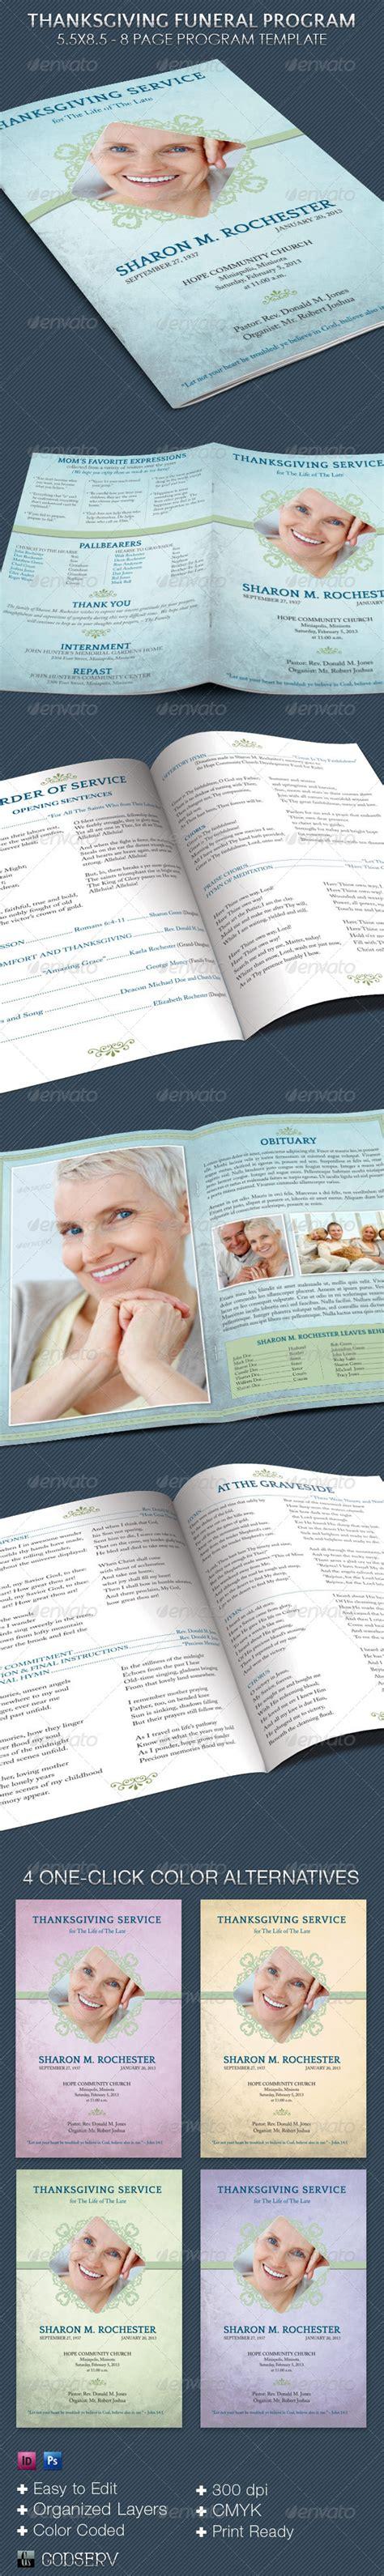 Indesign Program Lookup Beforebuying Funeral Program Template Indesign